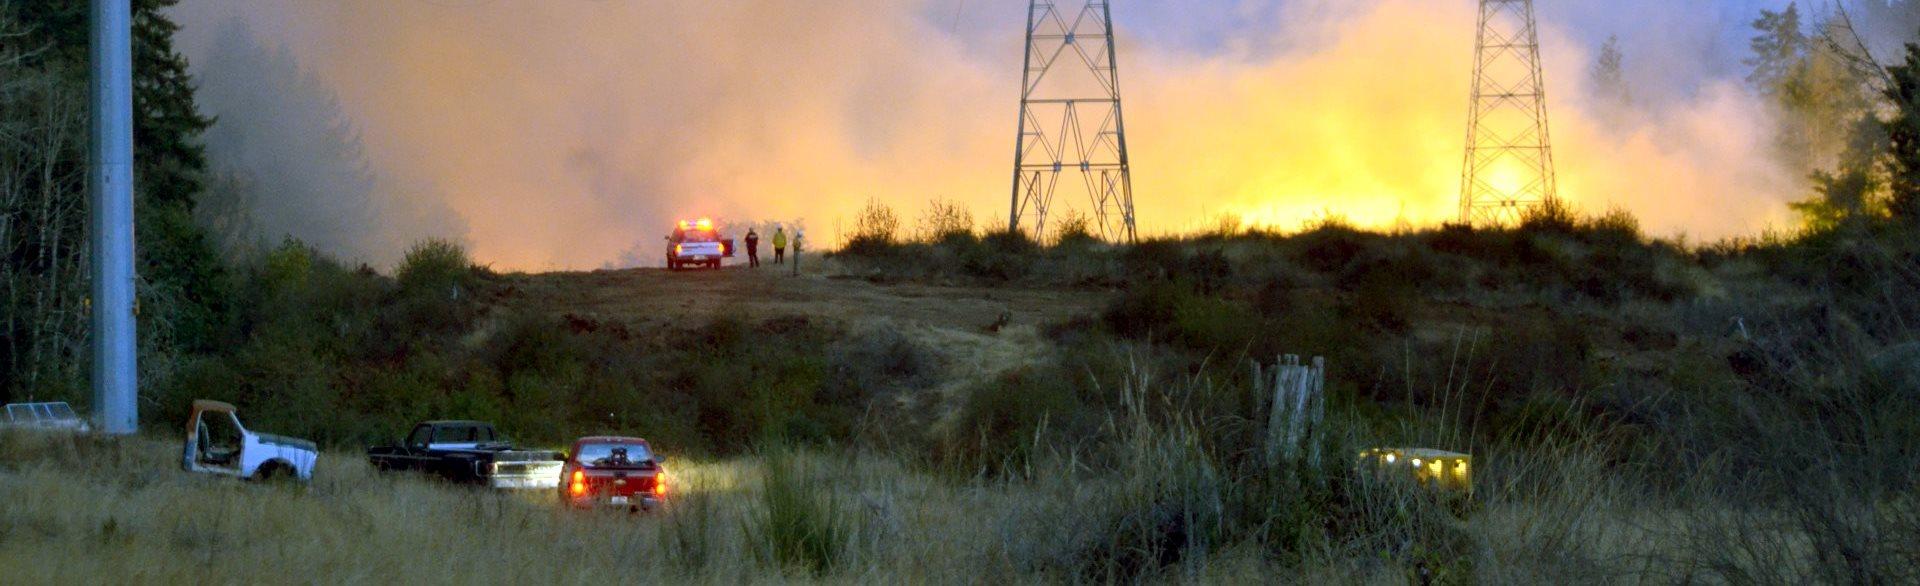 Util fire behind towers